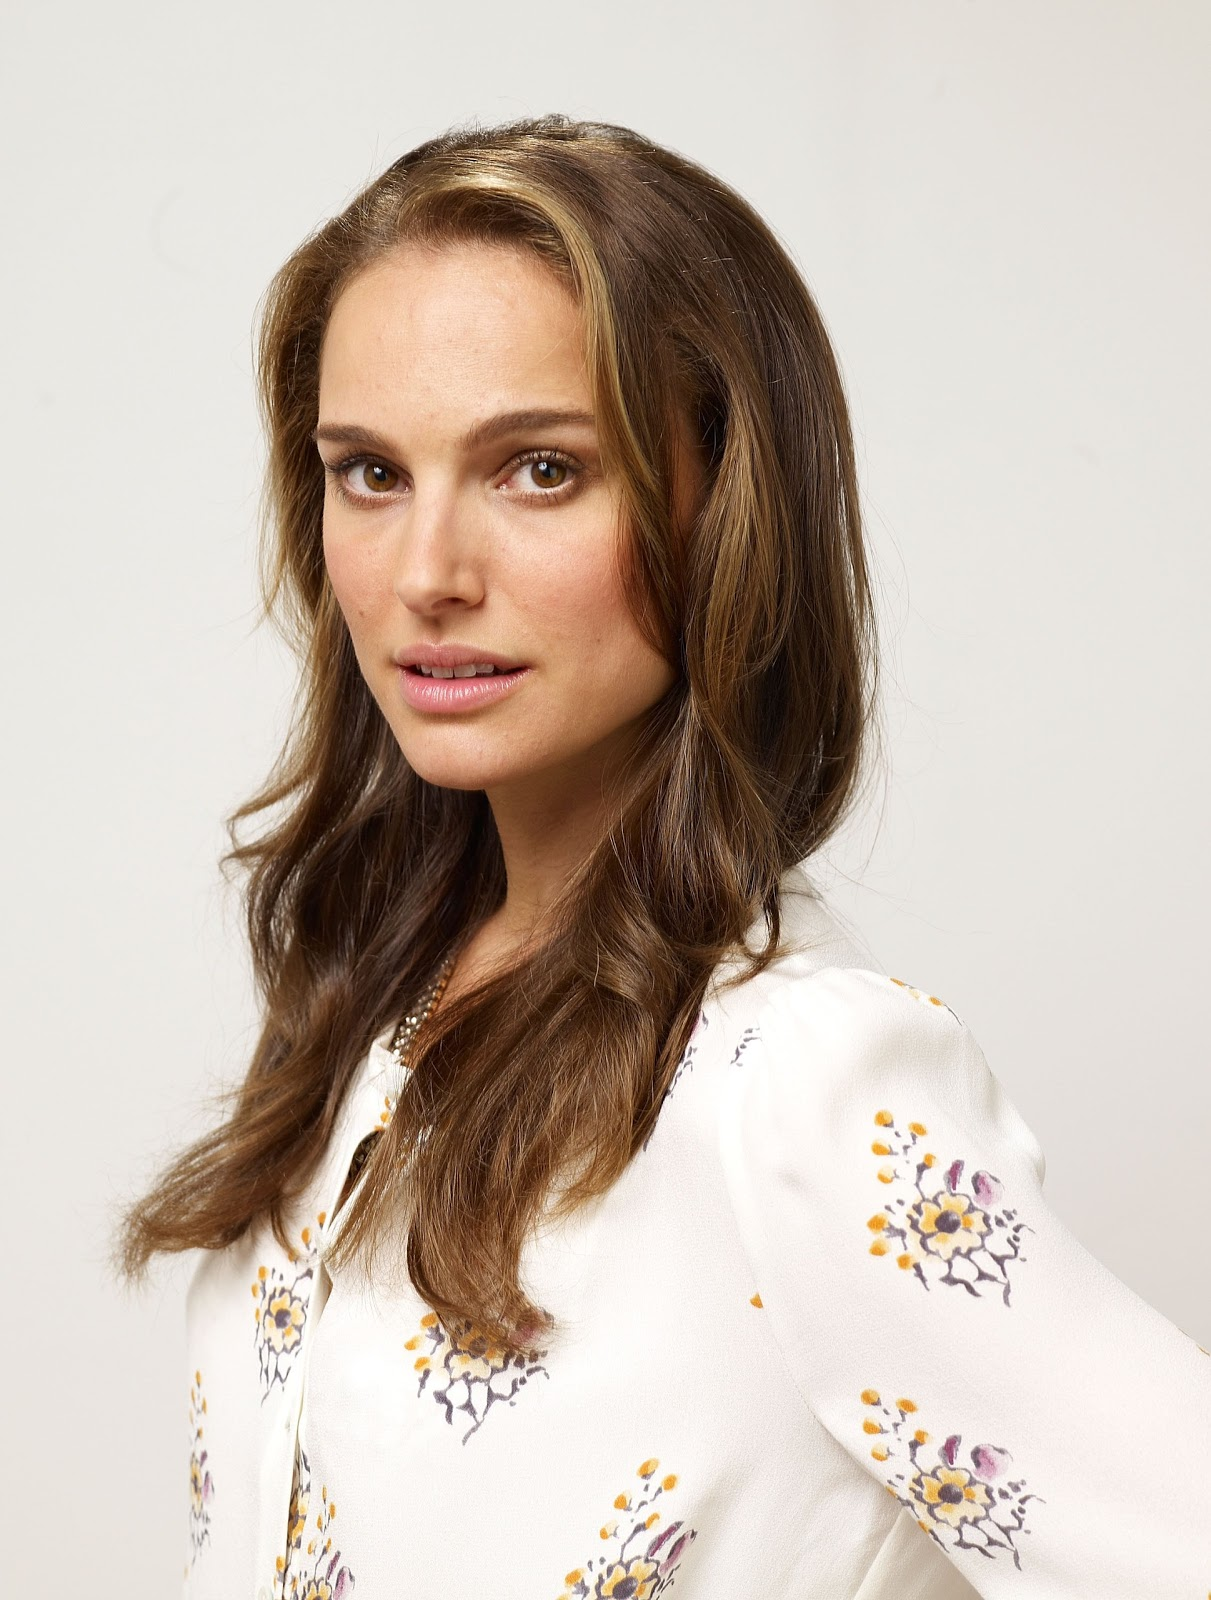 Natalie Portman Pictures Gallery 11  Film Actresses-3176